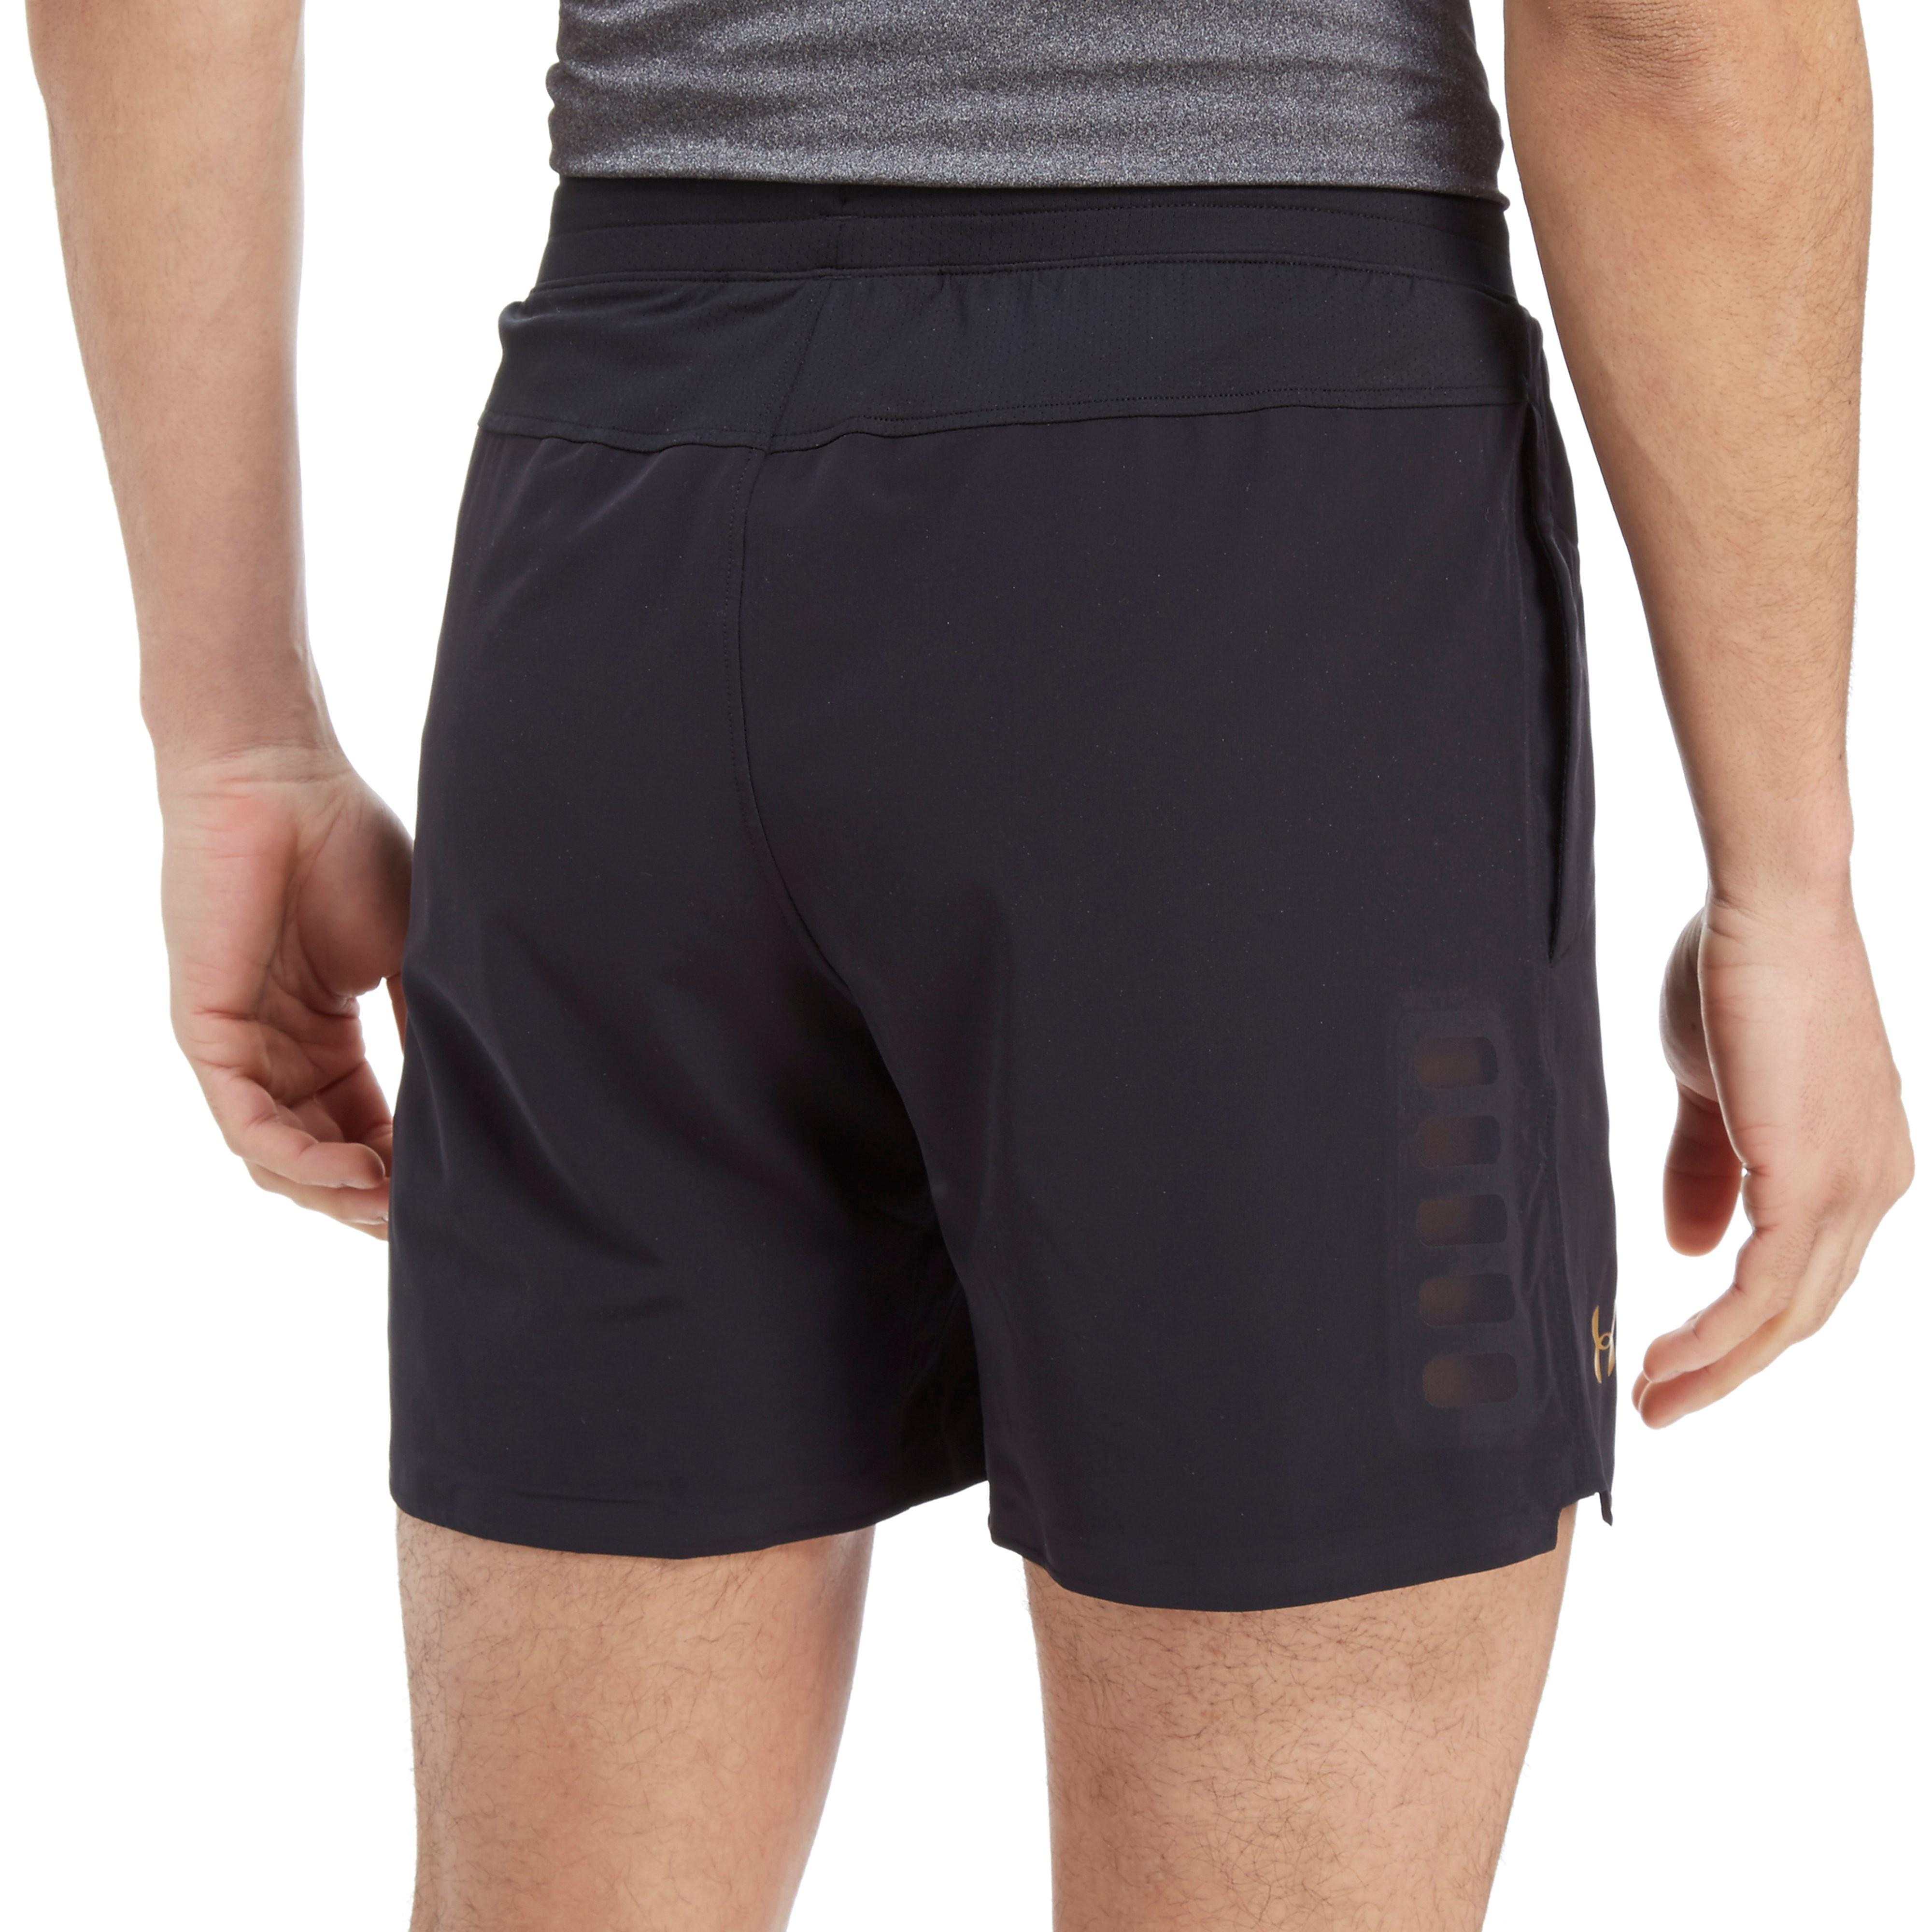 Under Armour Perpetual Men's Training Shorts